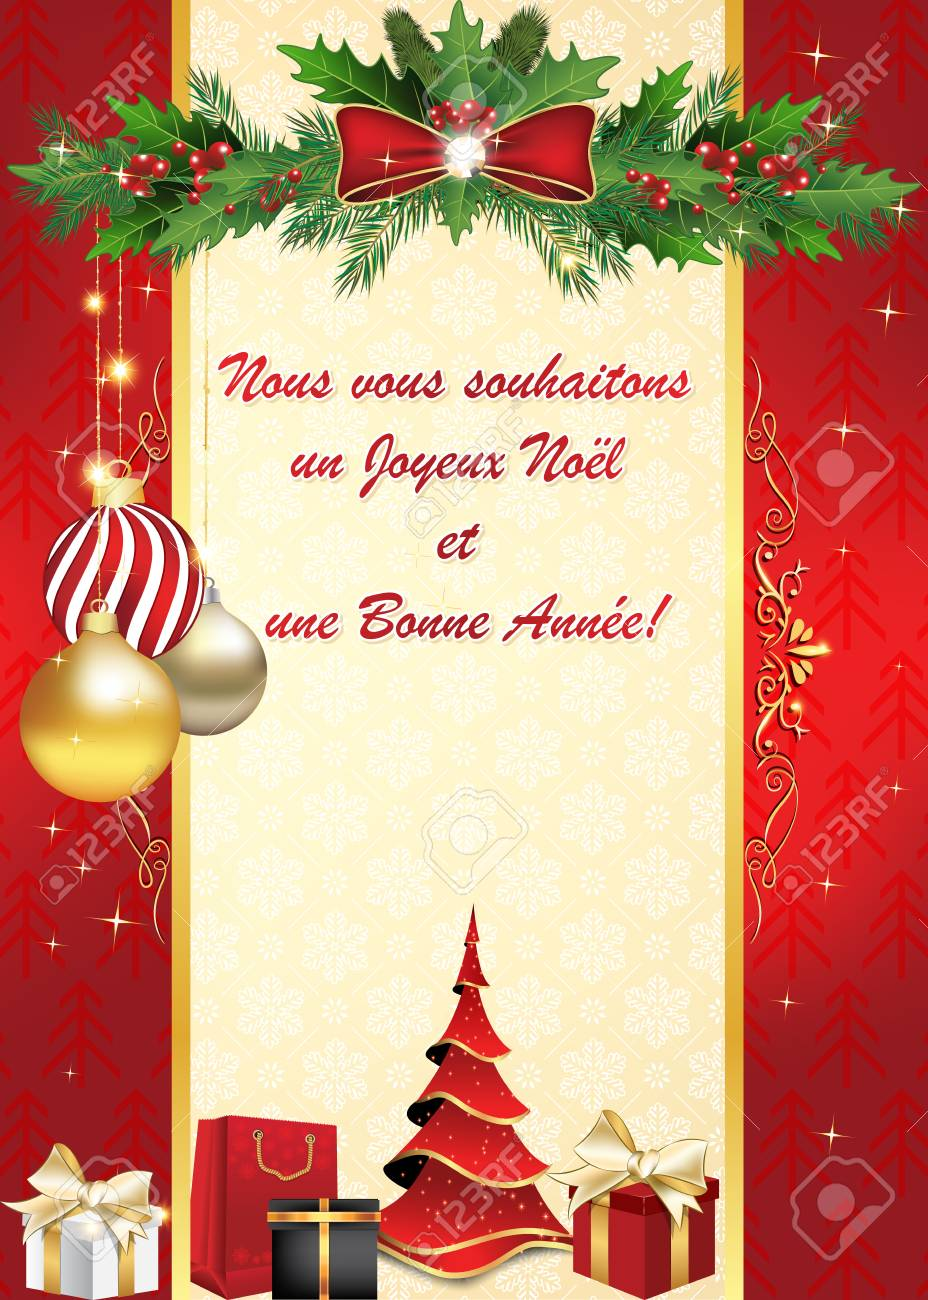 Ich Wünsche Dir Frohe Weihnachten Französisch.Ich Wünsche Dir Frohe Weihnachten Französisch Italiaansinschoonhoven